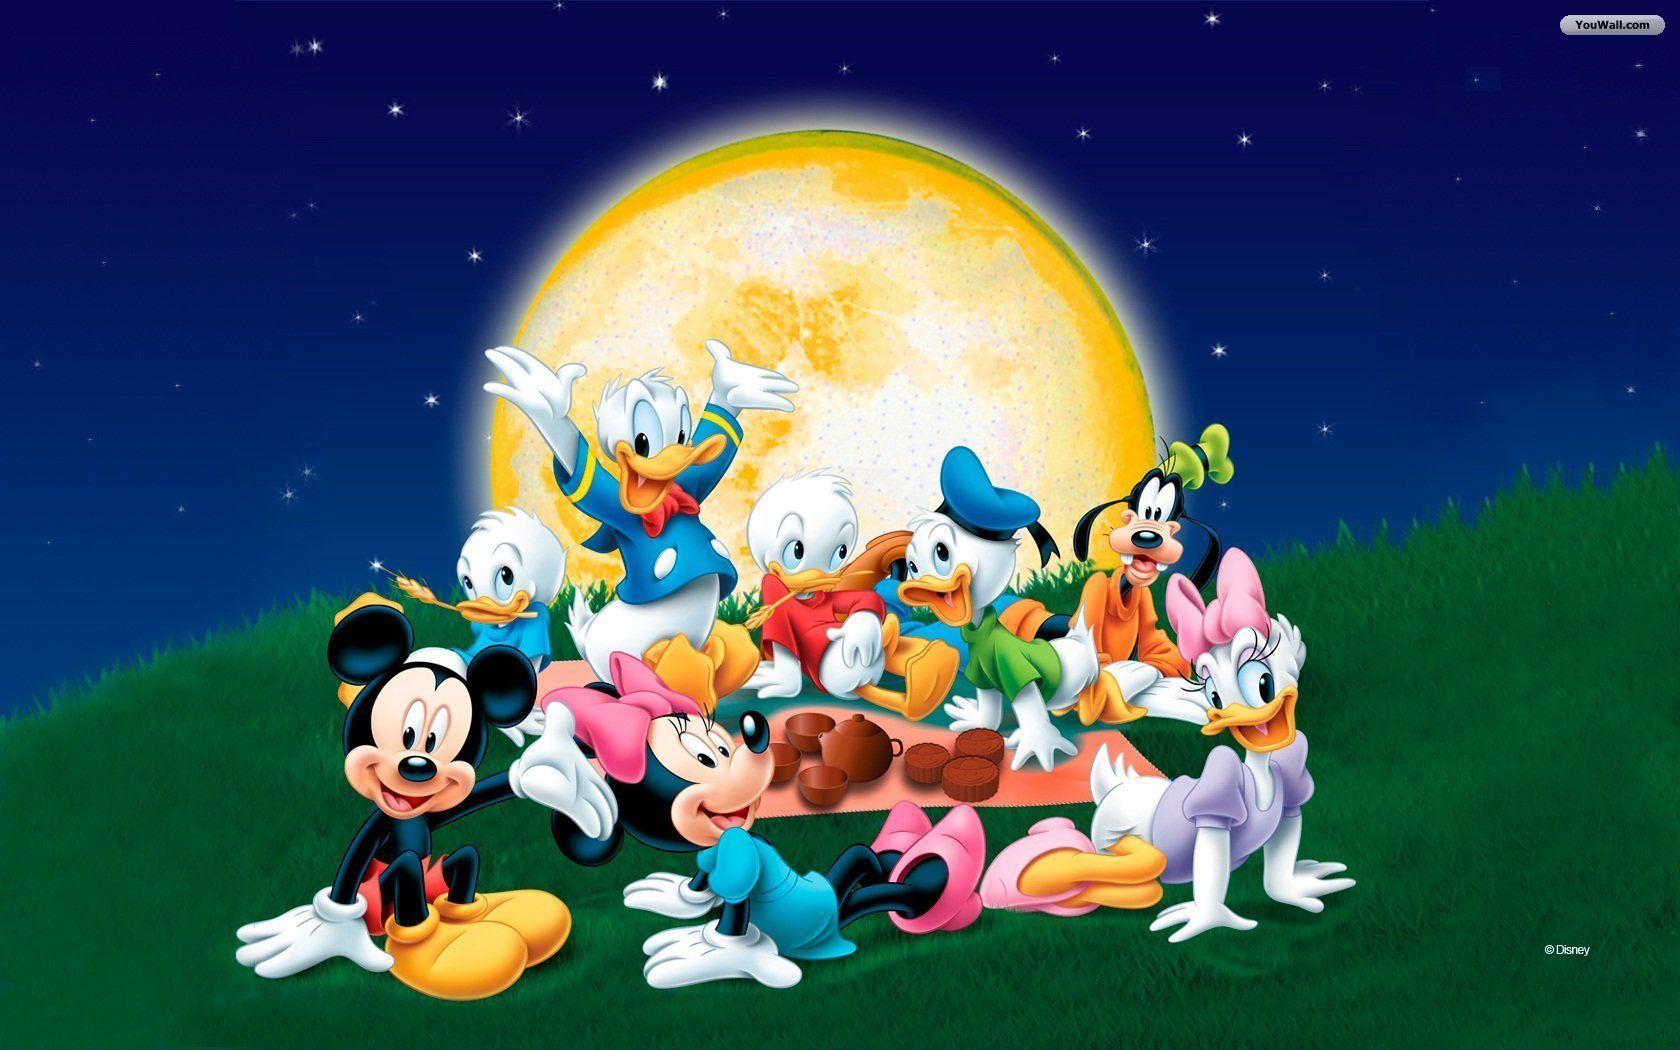 Wallpaper downloader - Free Disney Backgrounds Wallpaper Cave